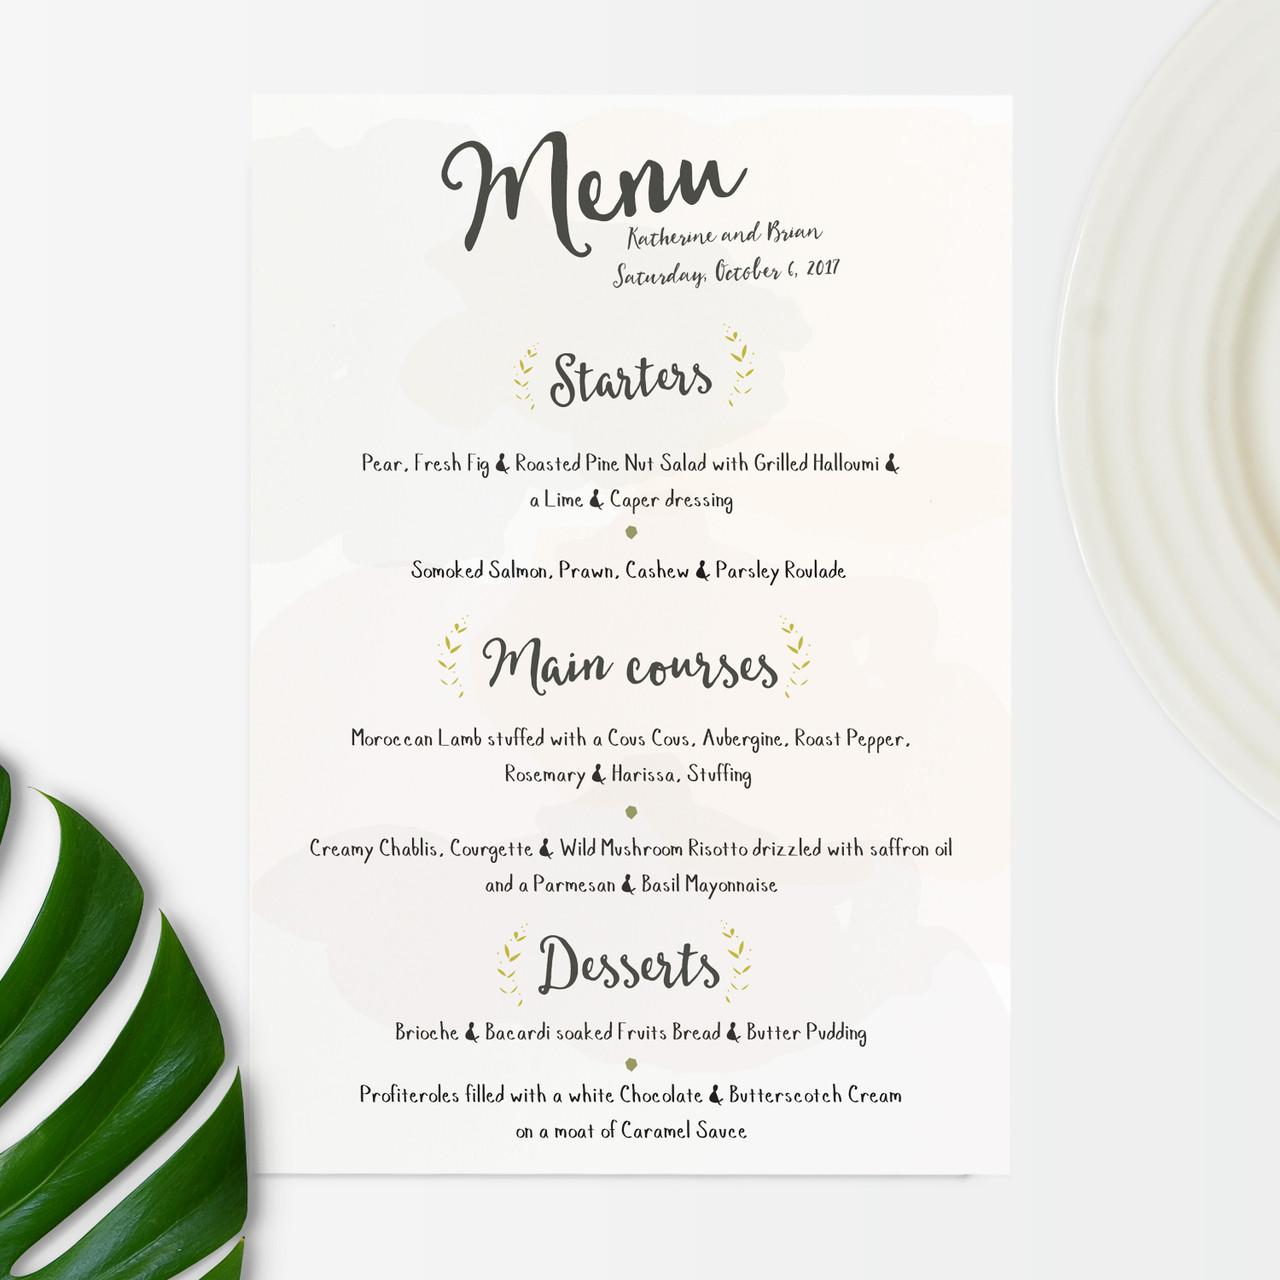 Wedding menu floral set holly francesca floral wedding invitation junglespirit Gallery